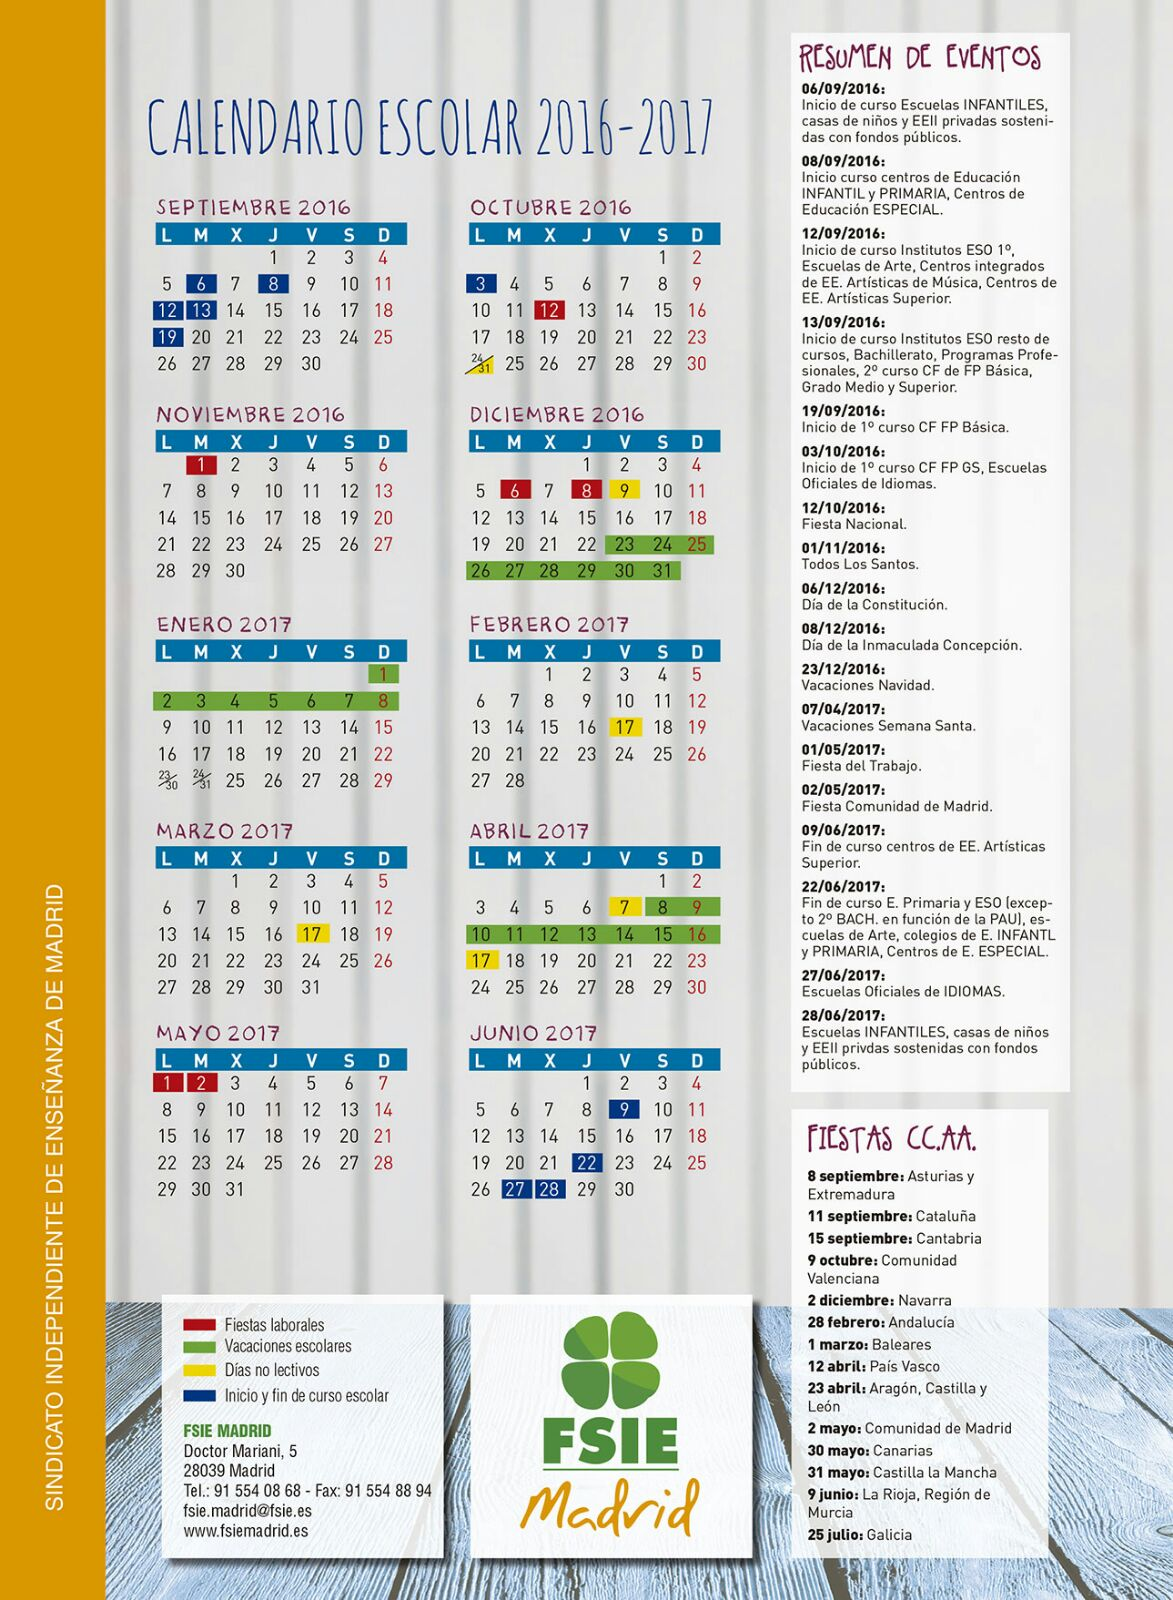 Calendario Escolar 18 19 Cantabria.Calendario Escolar Para El Curso 2016 2017 Fsie Madrid